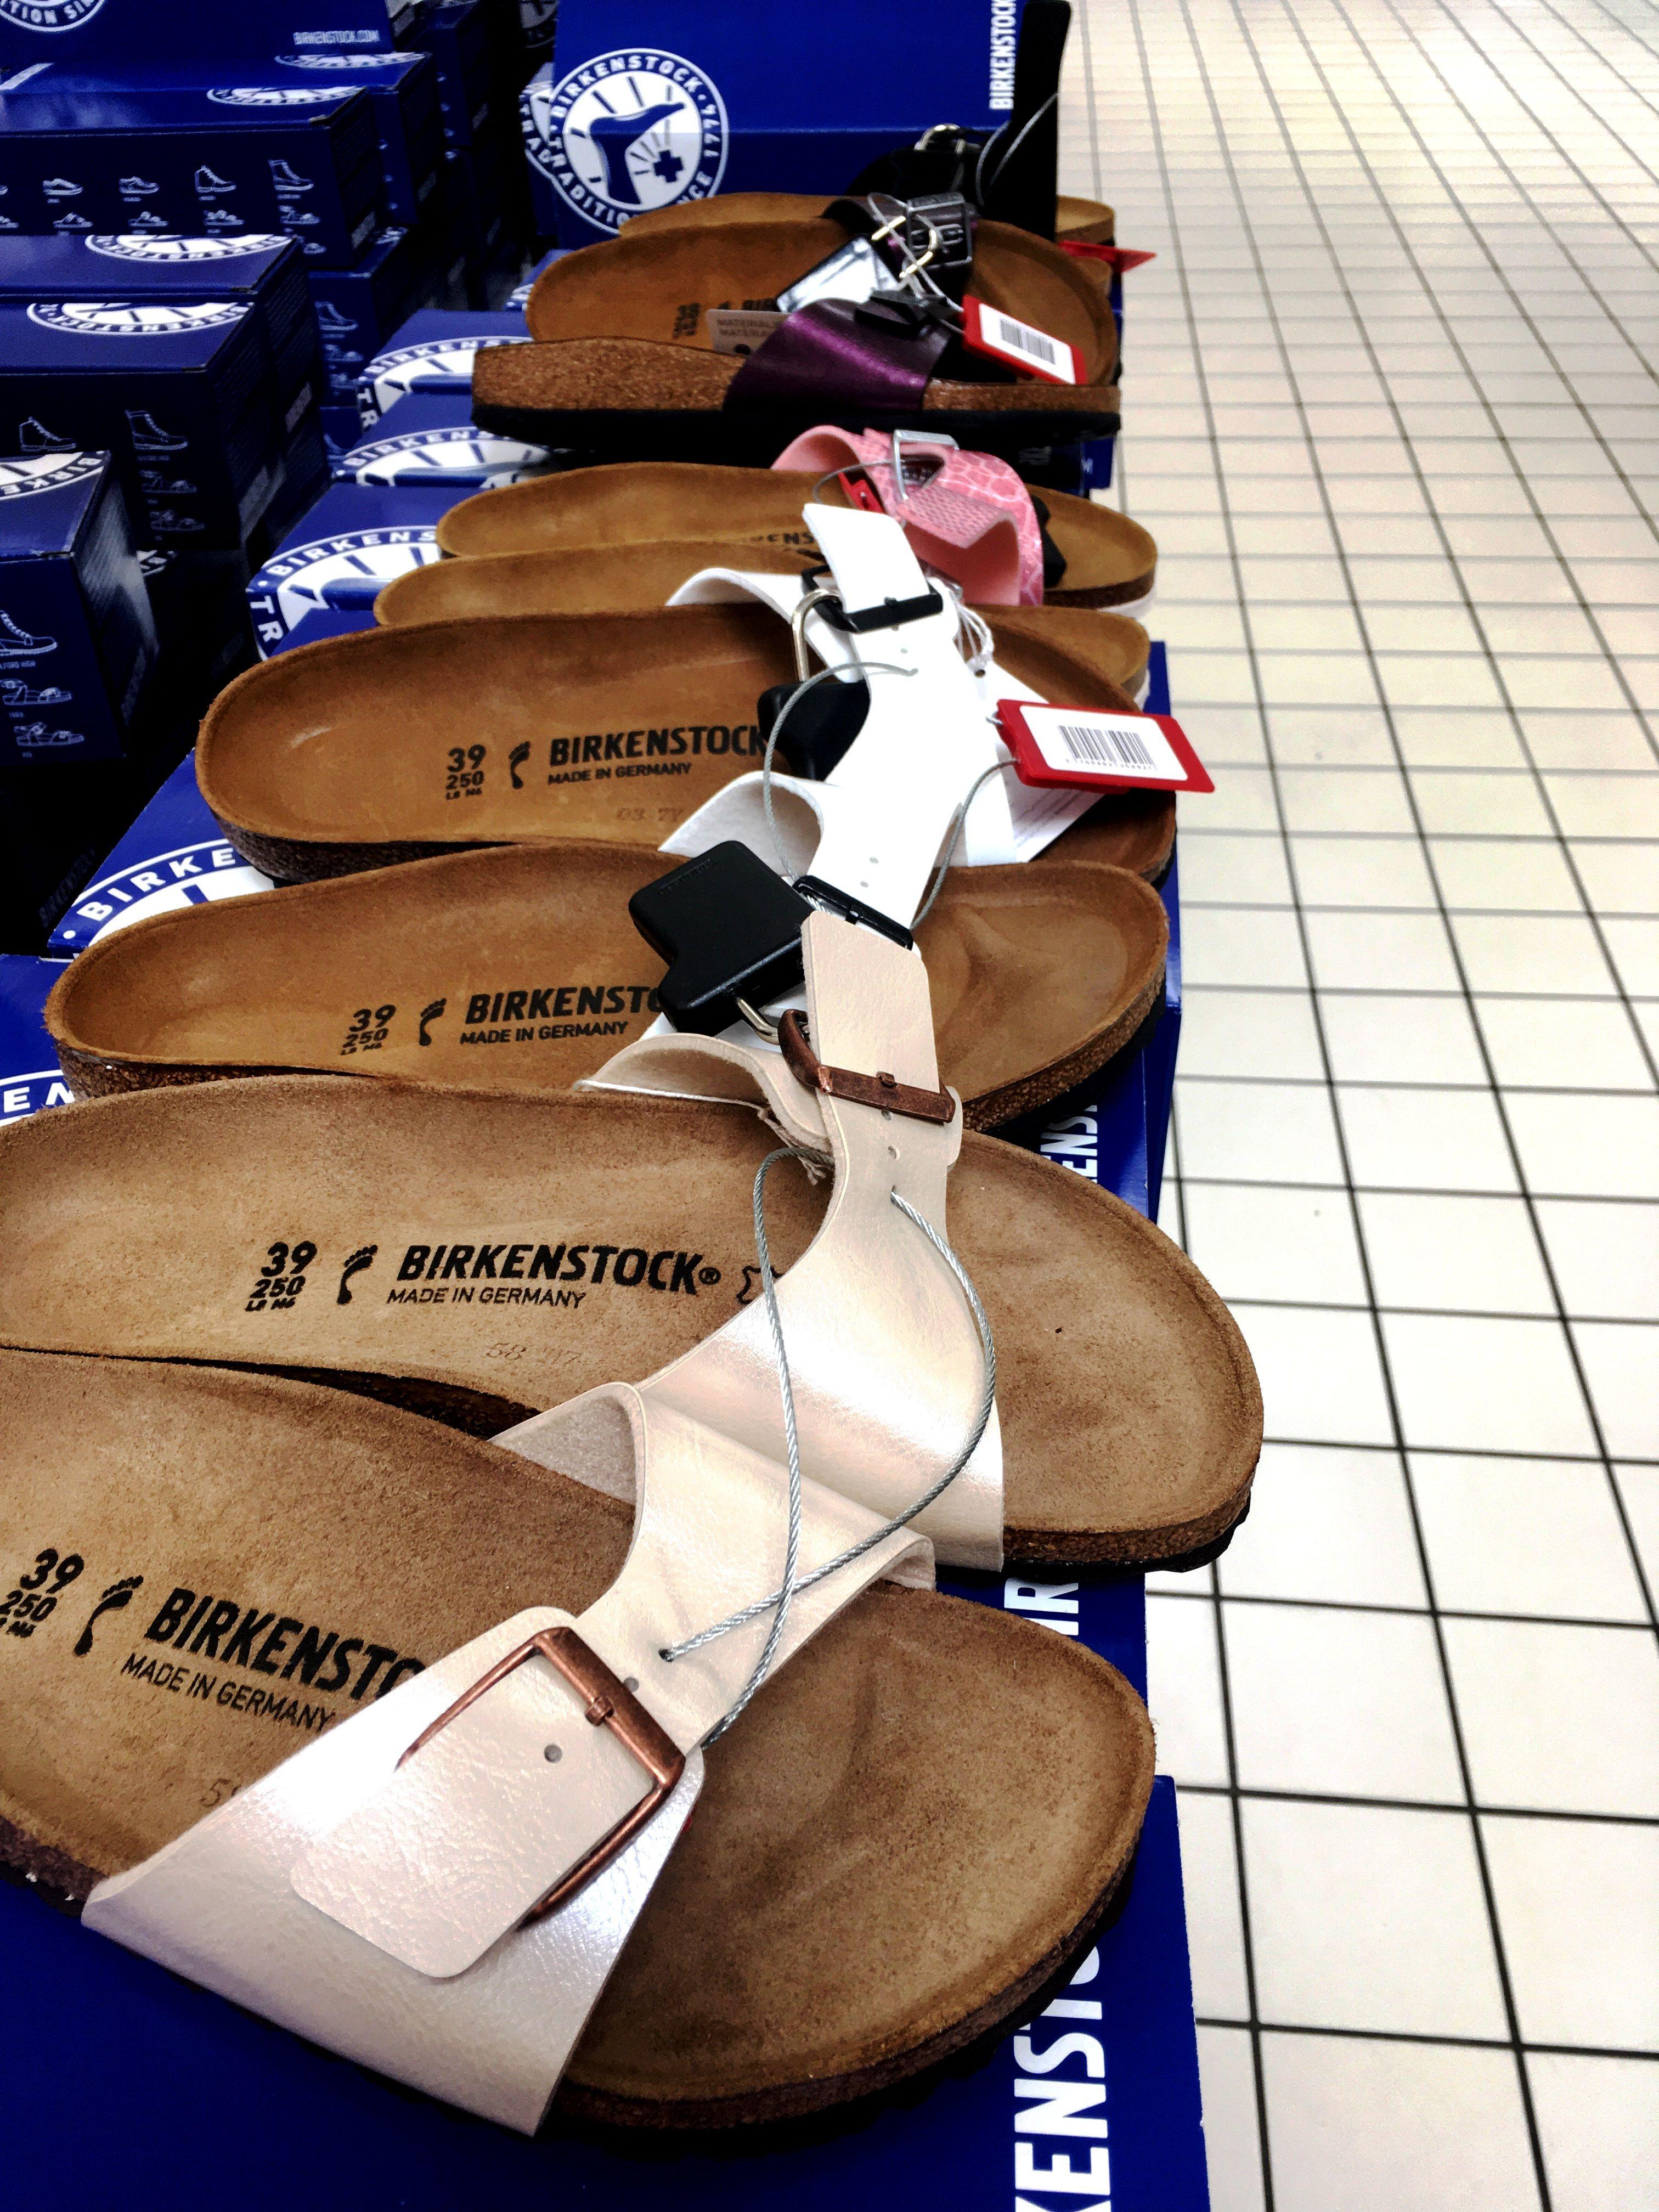 BirkenstockEt Perpignan OnIn Extenso Auchan OnIn Perpignan Extenso Auchan JlF1T3uKc